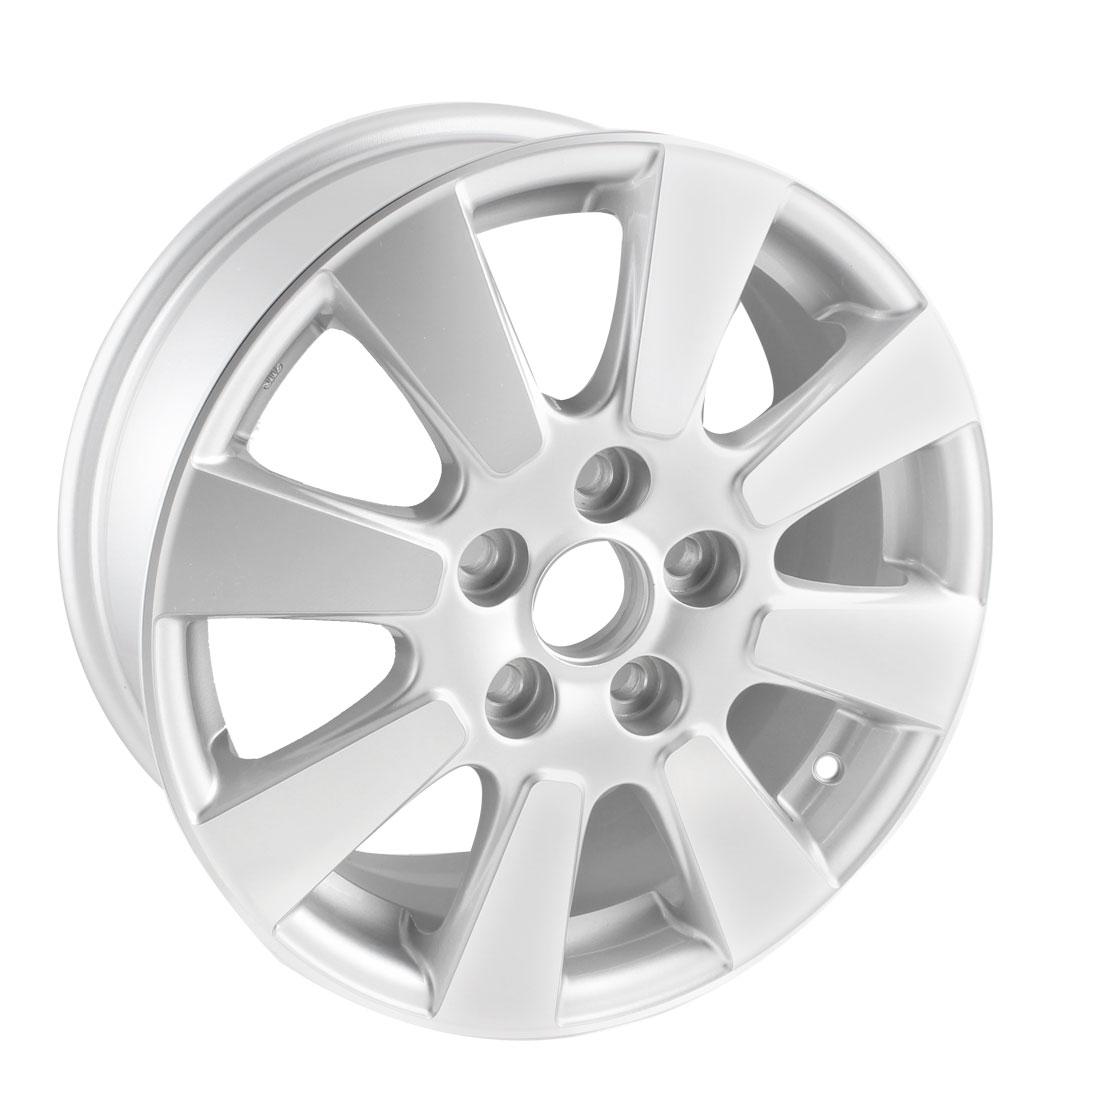 17 Inch Rim Diameter Alloy Wheel Rims for Car Automotive